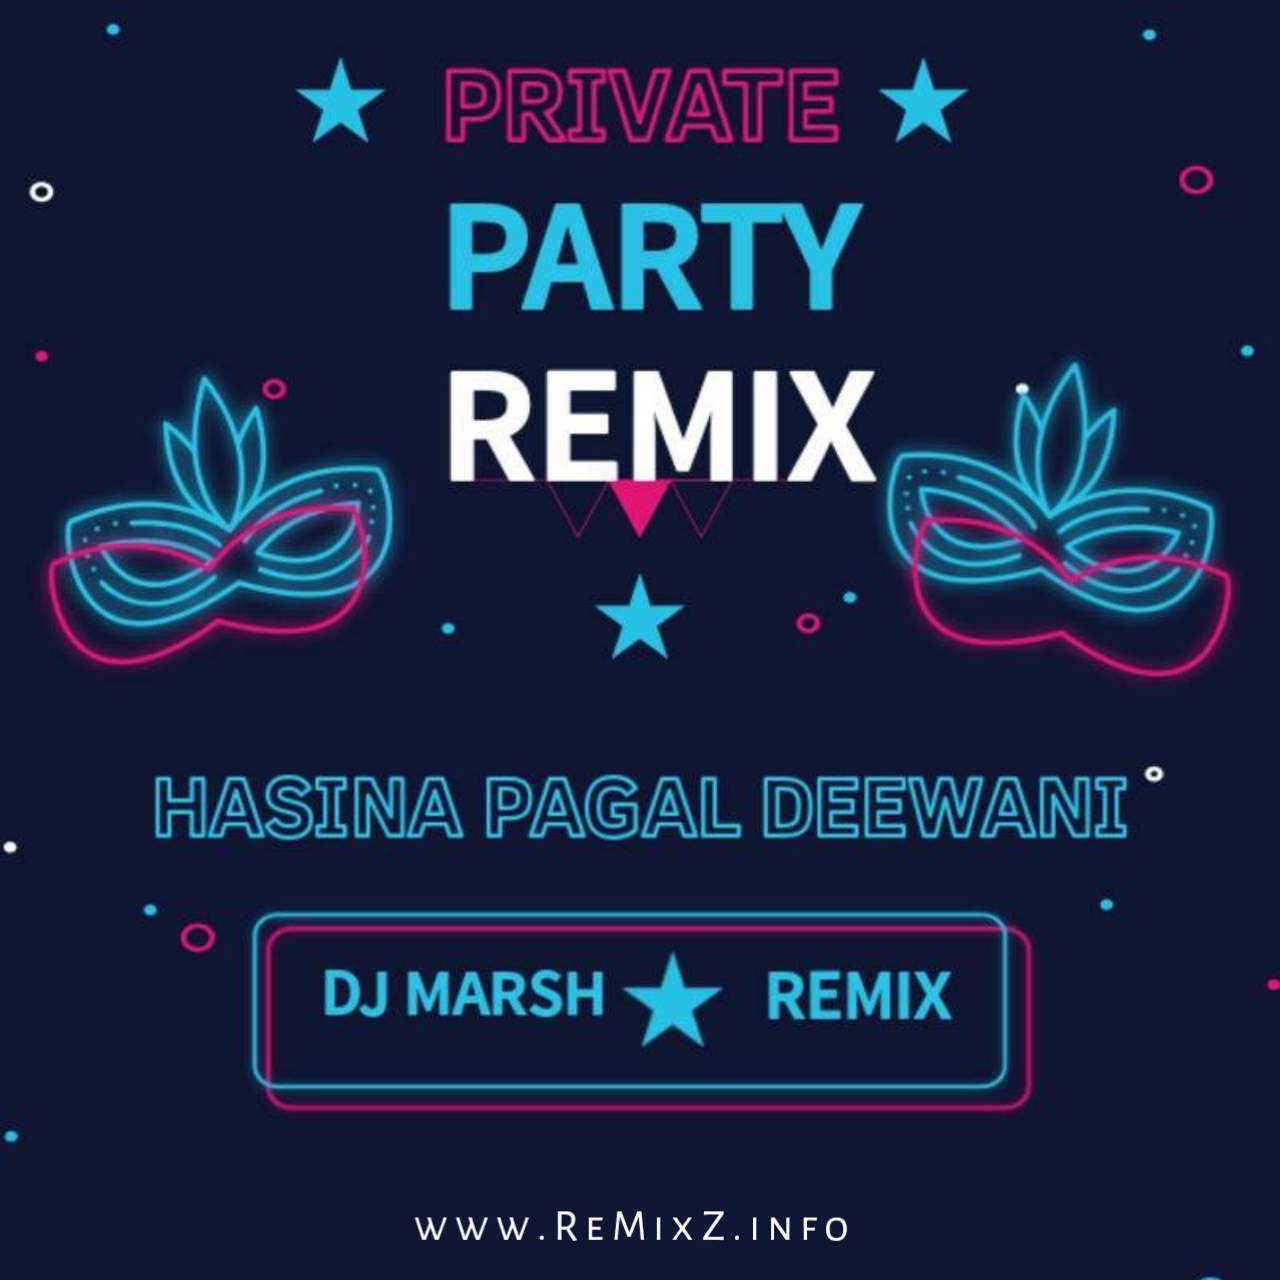 hasina-pagal-deewani-remix-dj-marsh.jpg